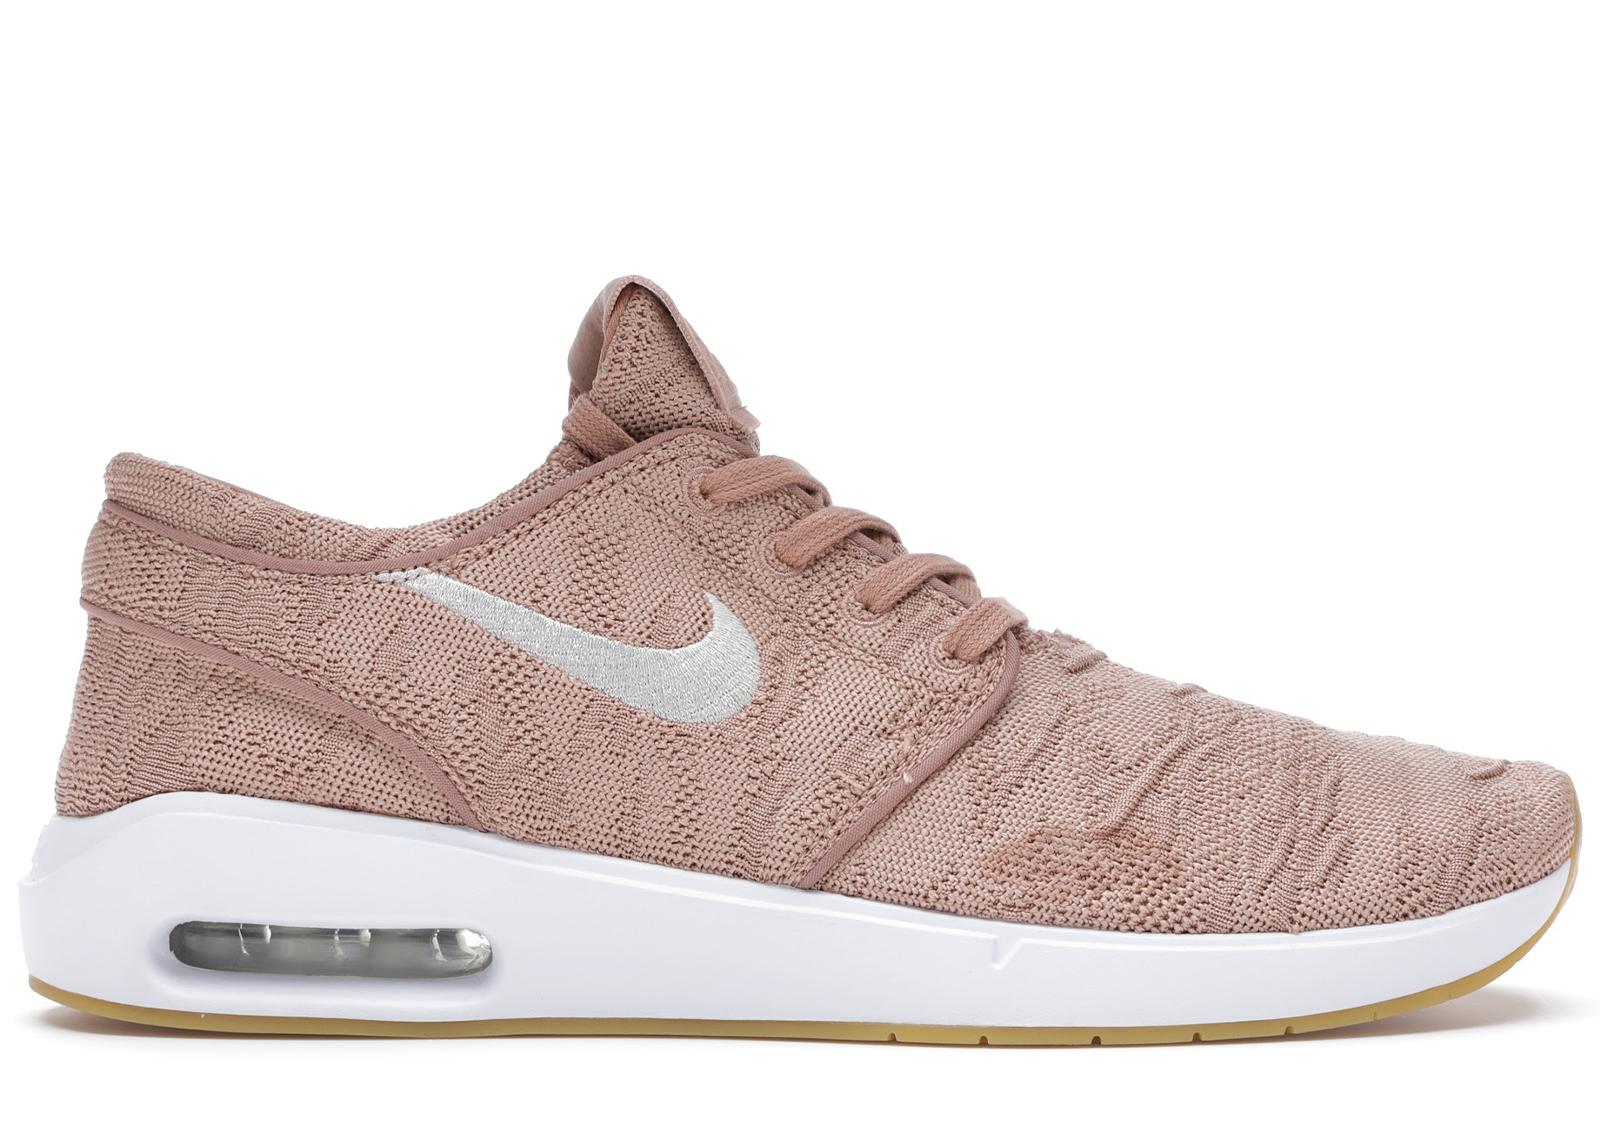 Nike SB Air Max Janoski 2 Rose Gold